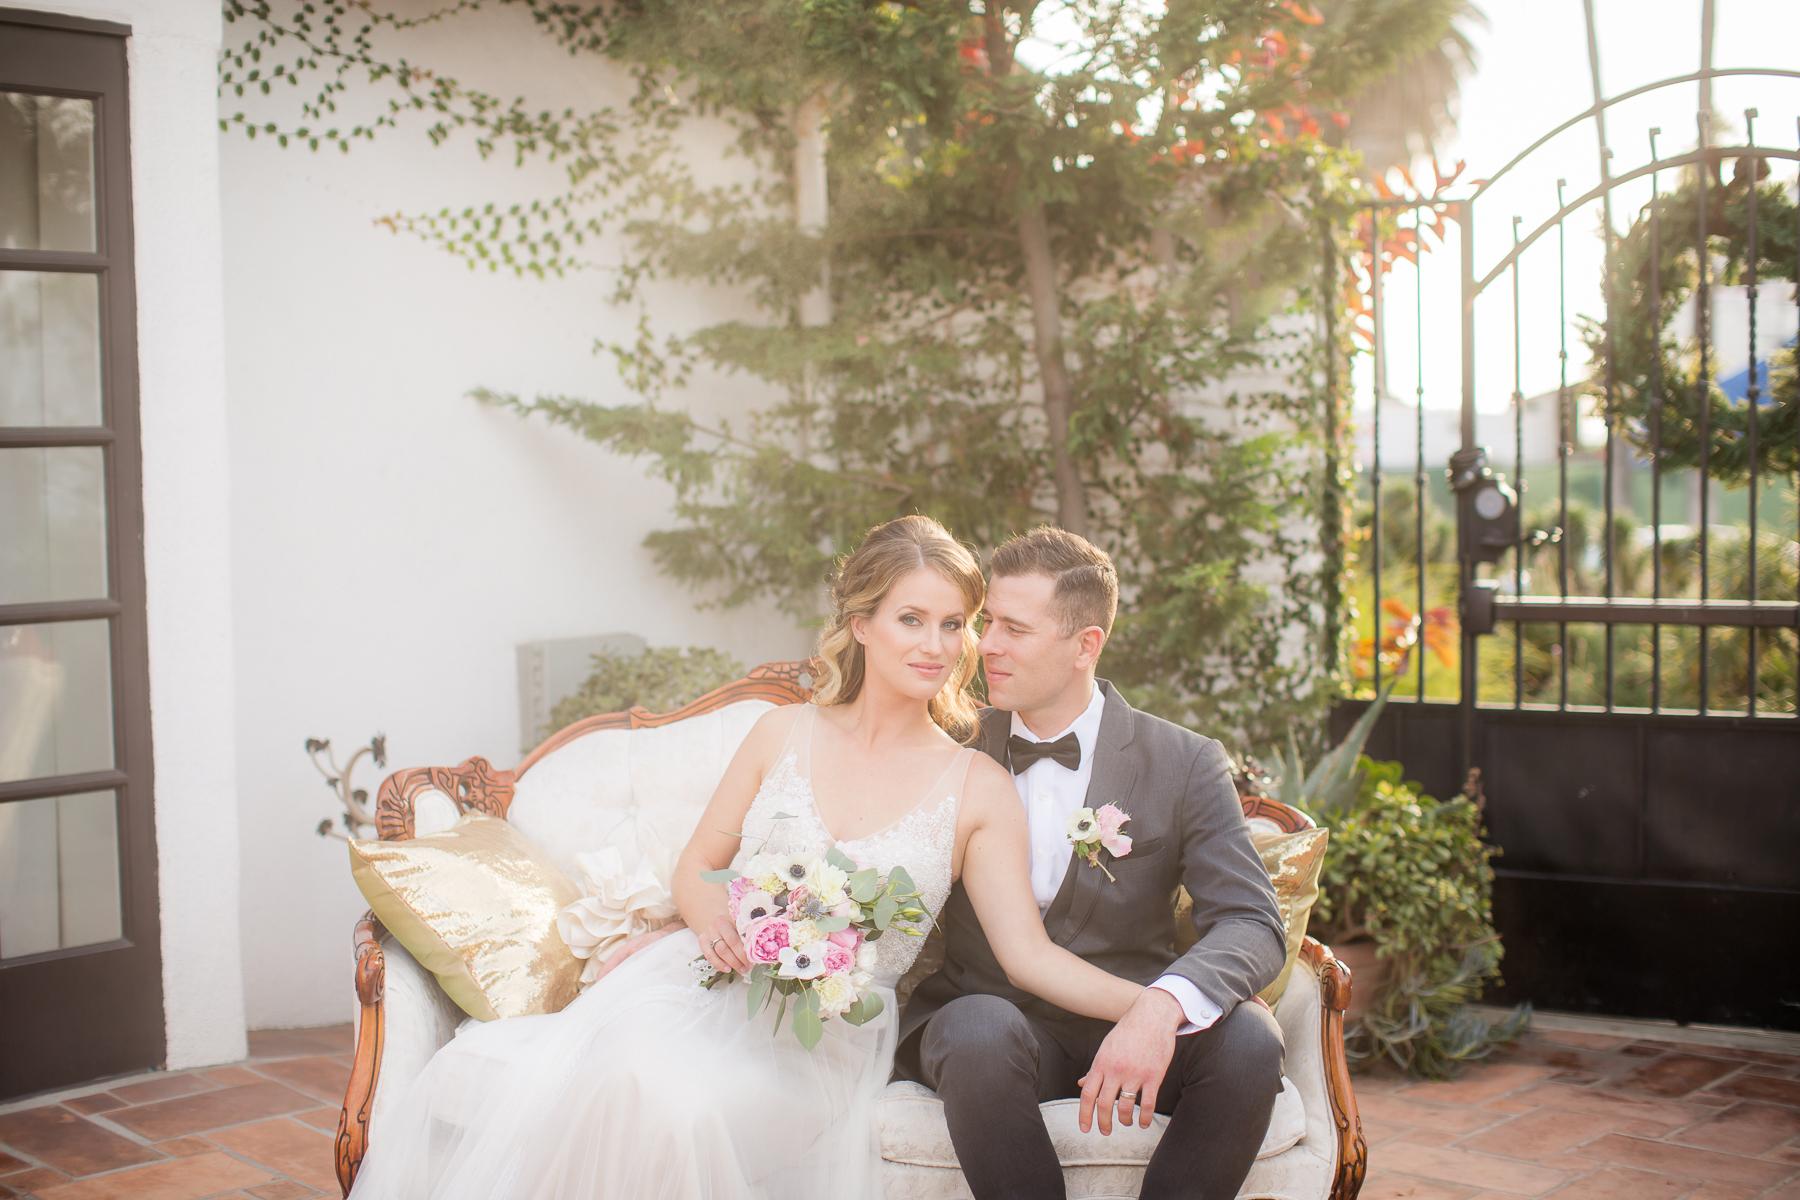 TheresaBridgetPhotography_weddinginspiration-350.jpg